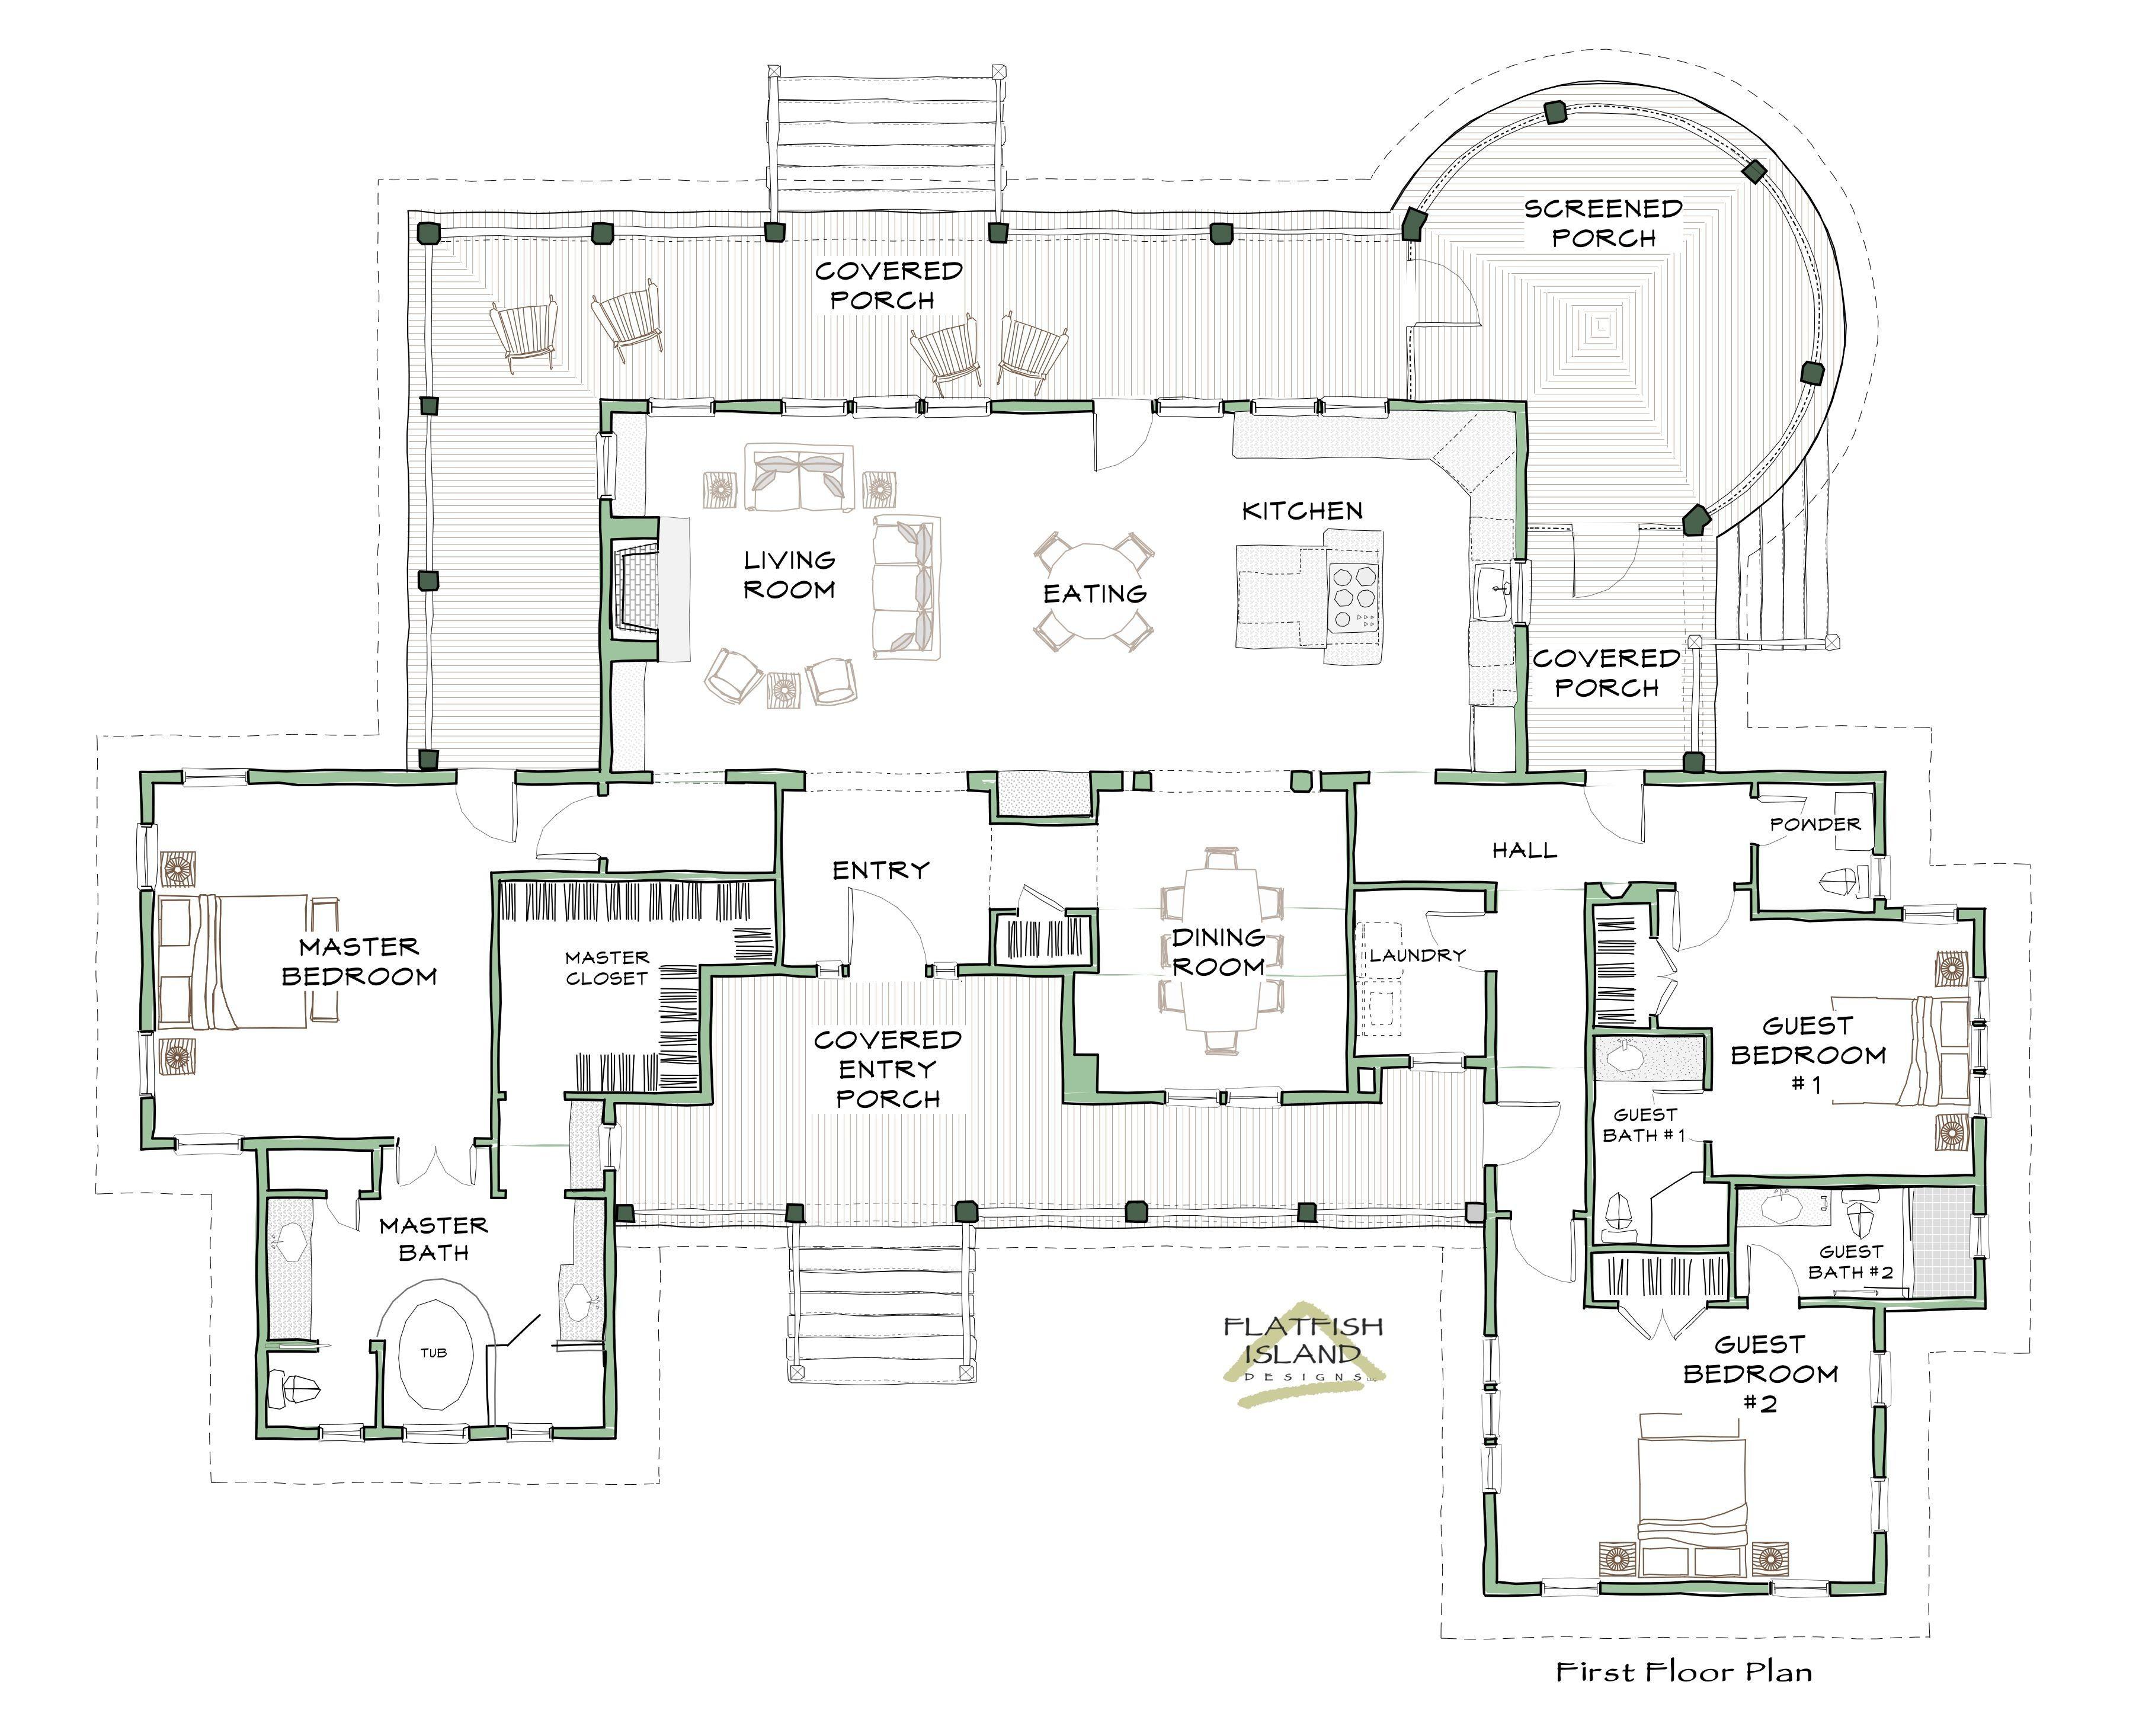 rest house design floor plan 28 images rest house plan design – Rest House Design Floor Plan